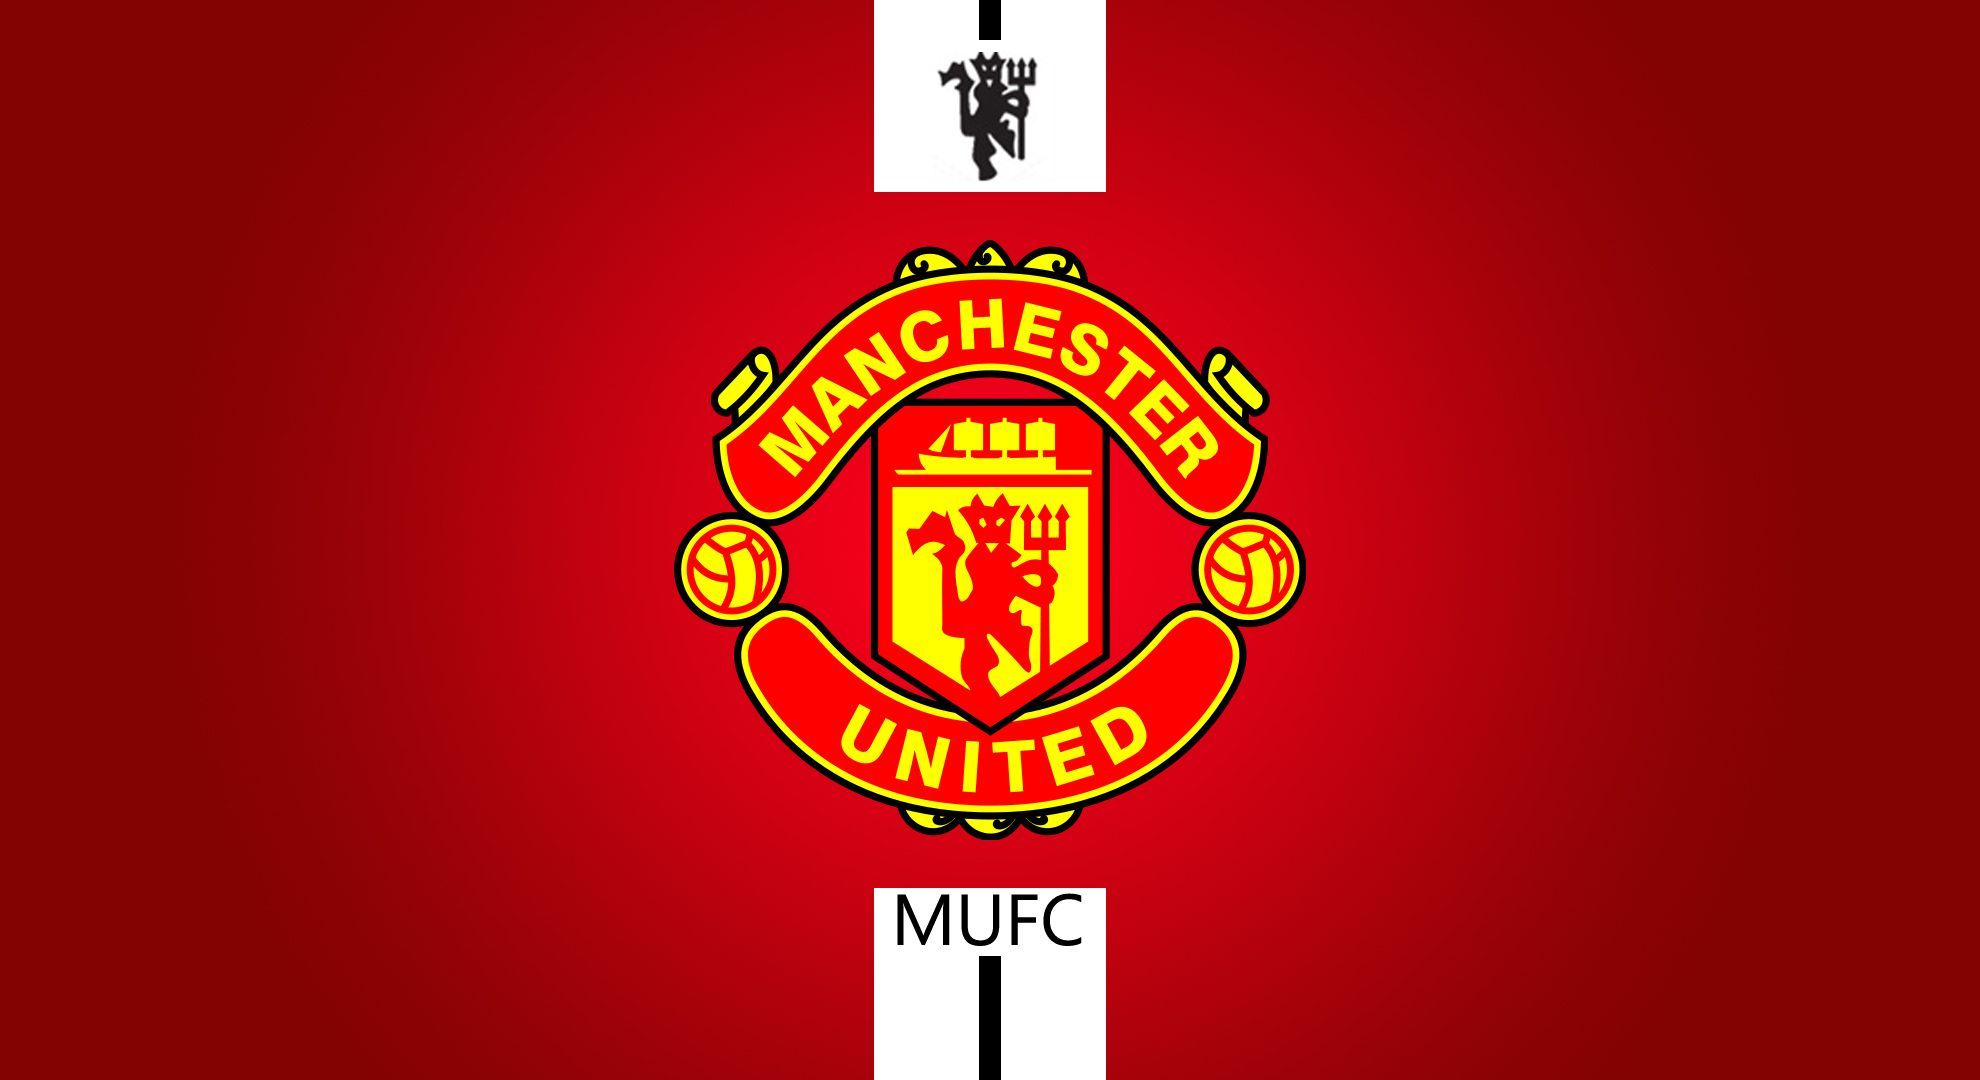 30 Manchester United Wallpaper By Marjorie Mcgilbon